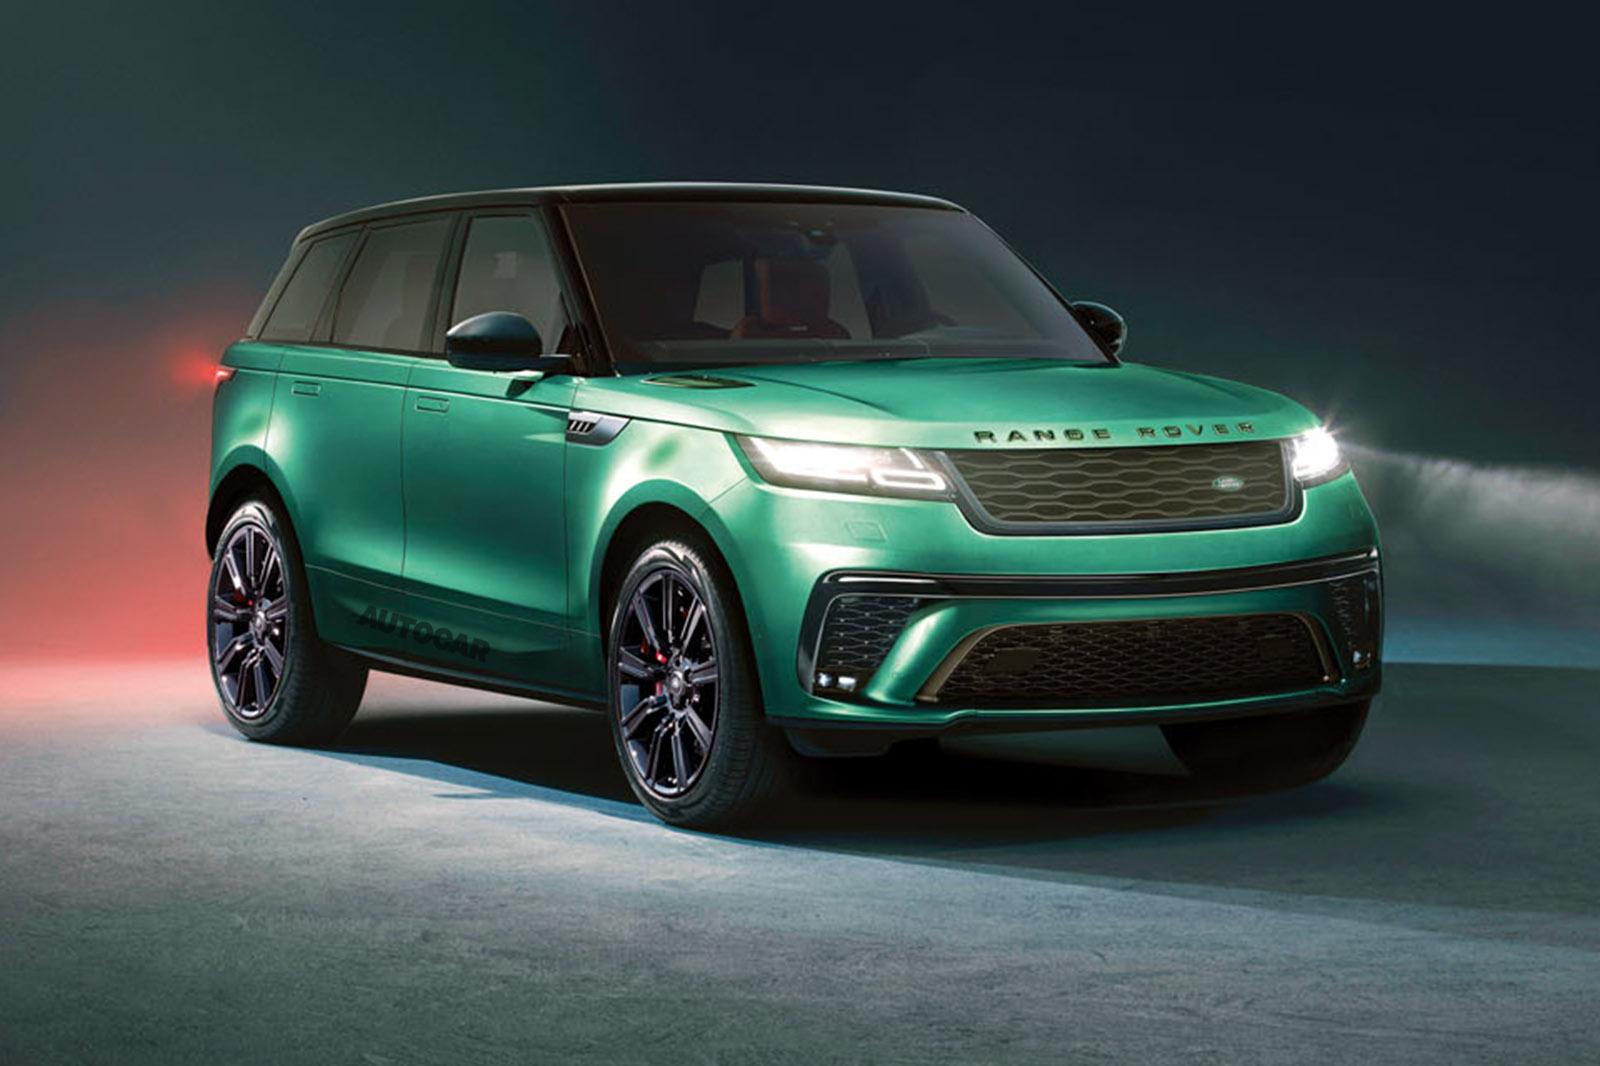 2022 Land Rover Range Rover Sport: Choosing the Right Trim